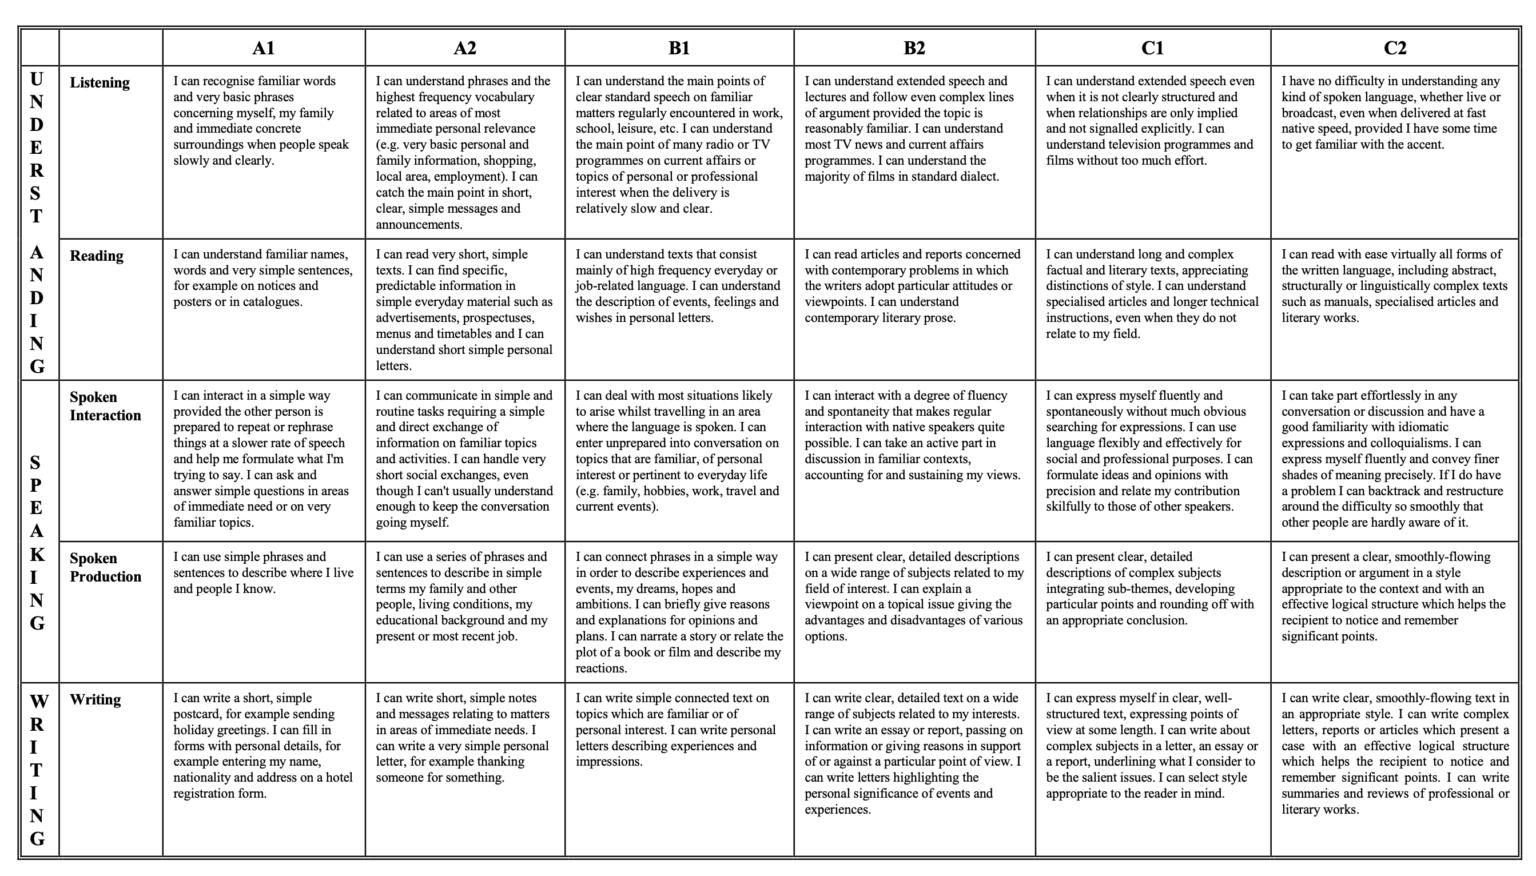 Self assessment CEFR Levels